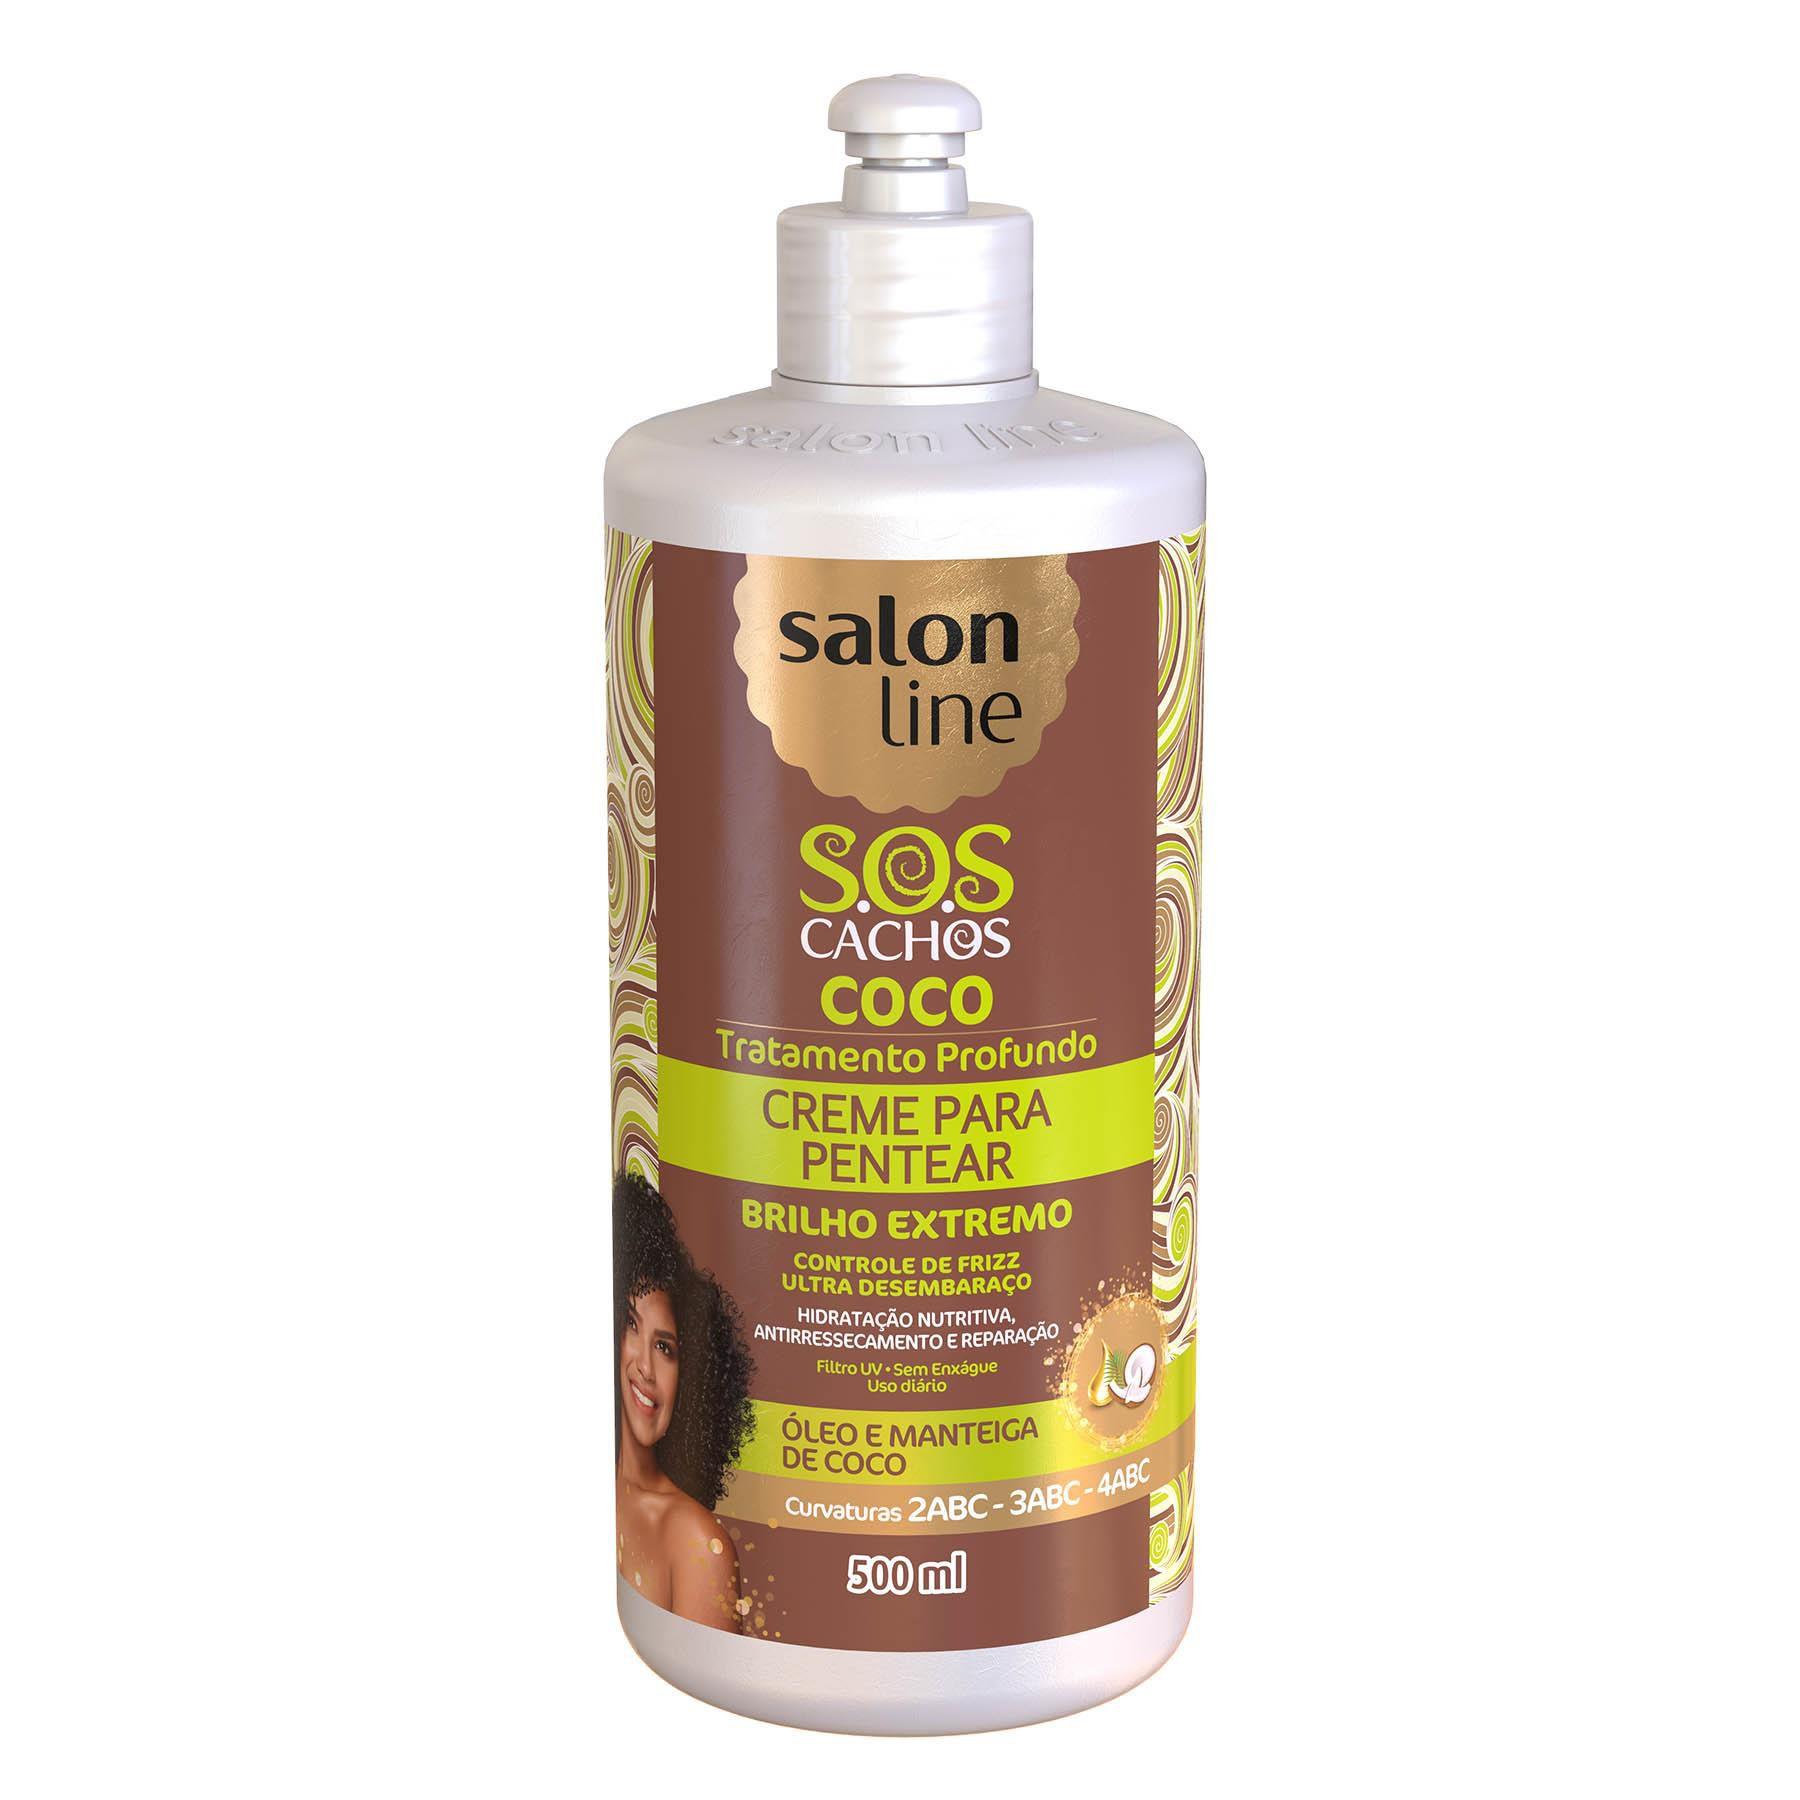 Salon Line Creme para Pentear S.O.S Cachos Coco Tratamento Profundo  500ml